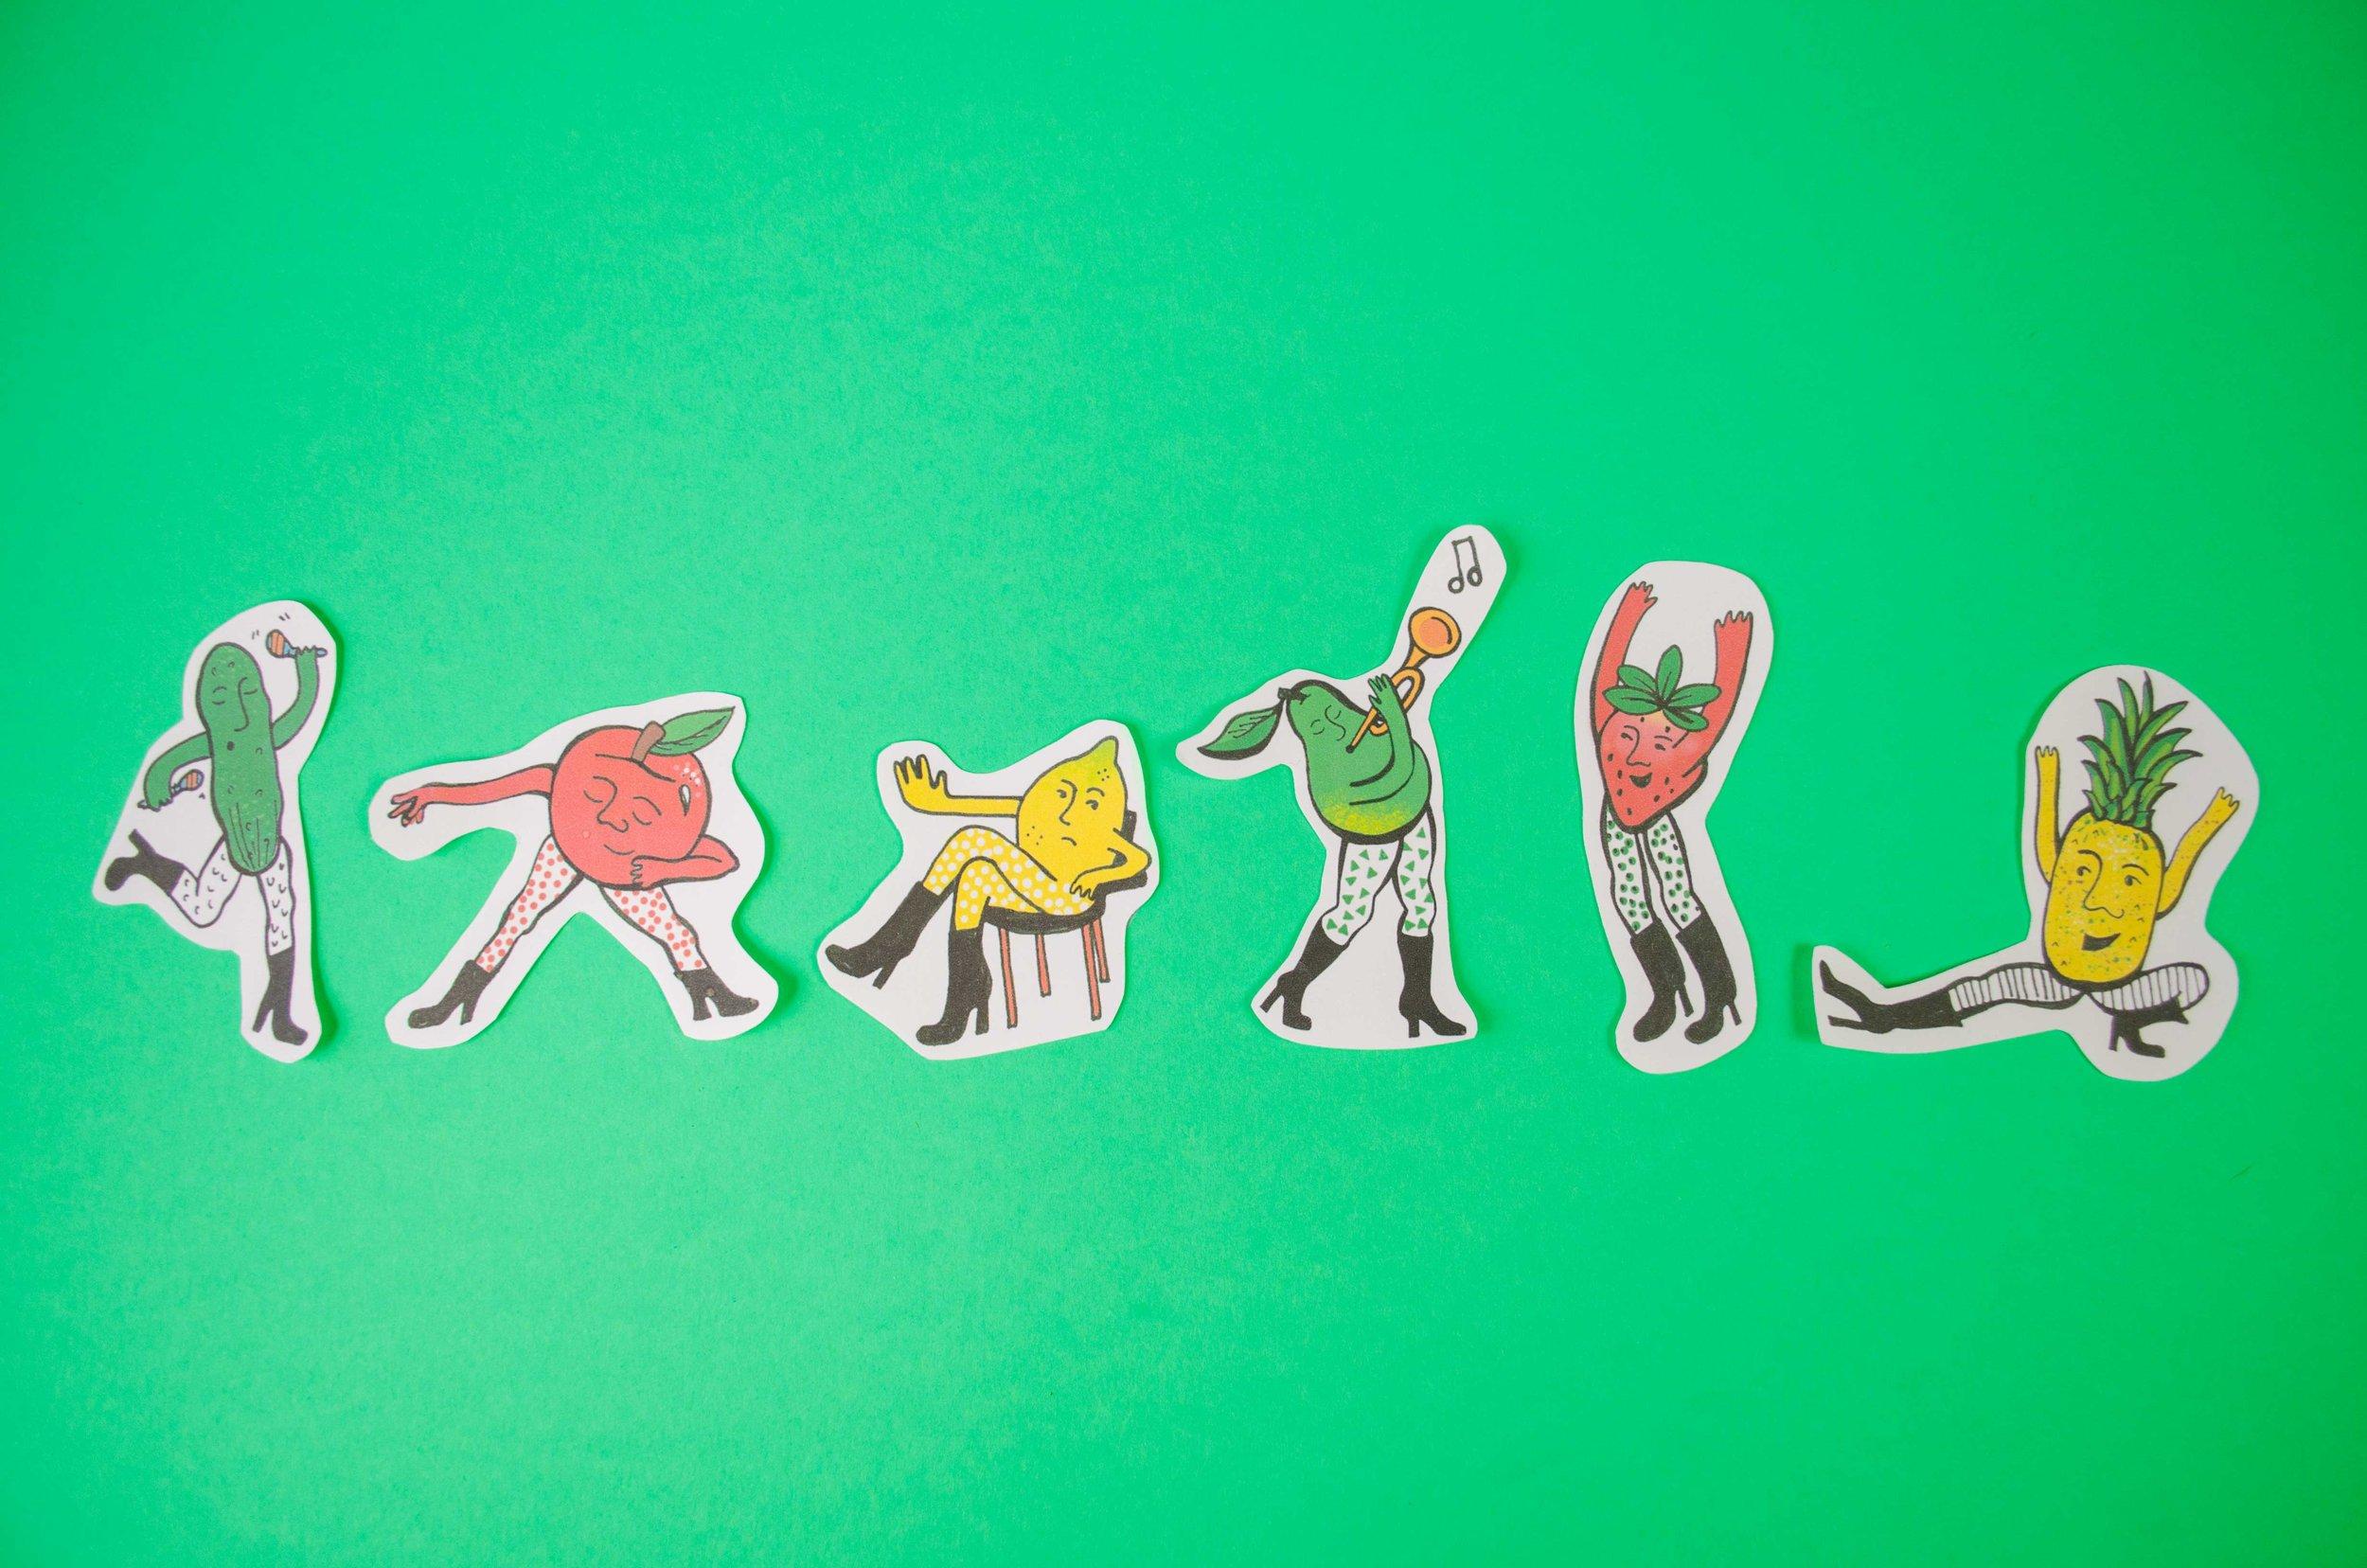 Dancing Fruit Stickers by Julie Finn